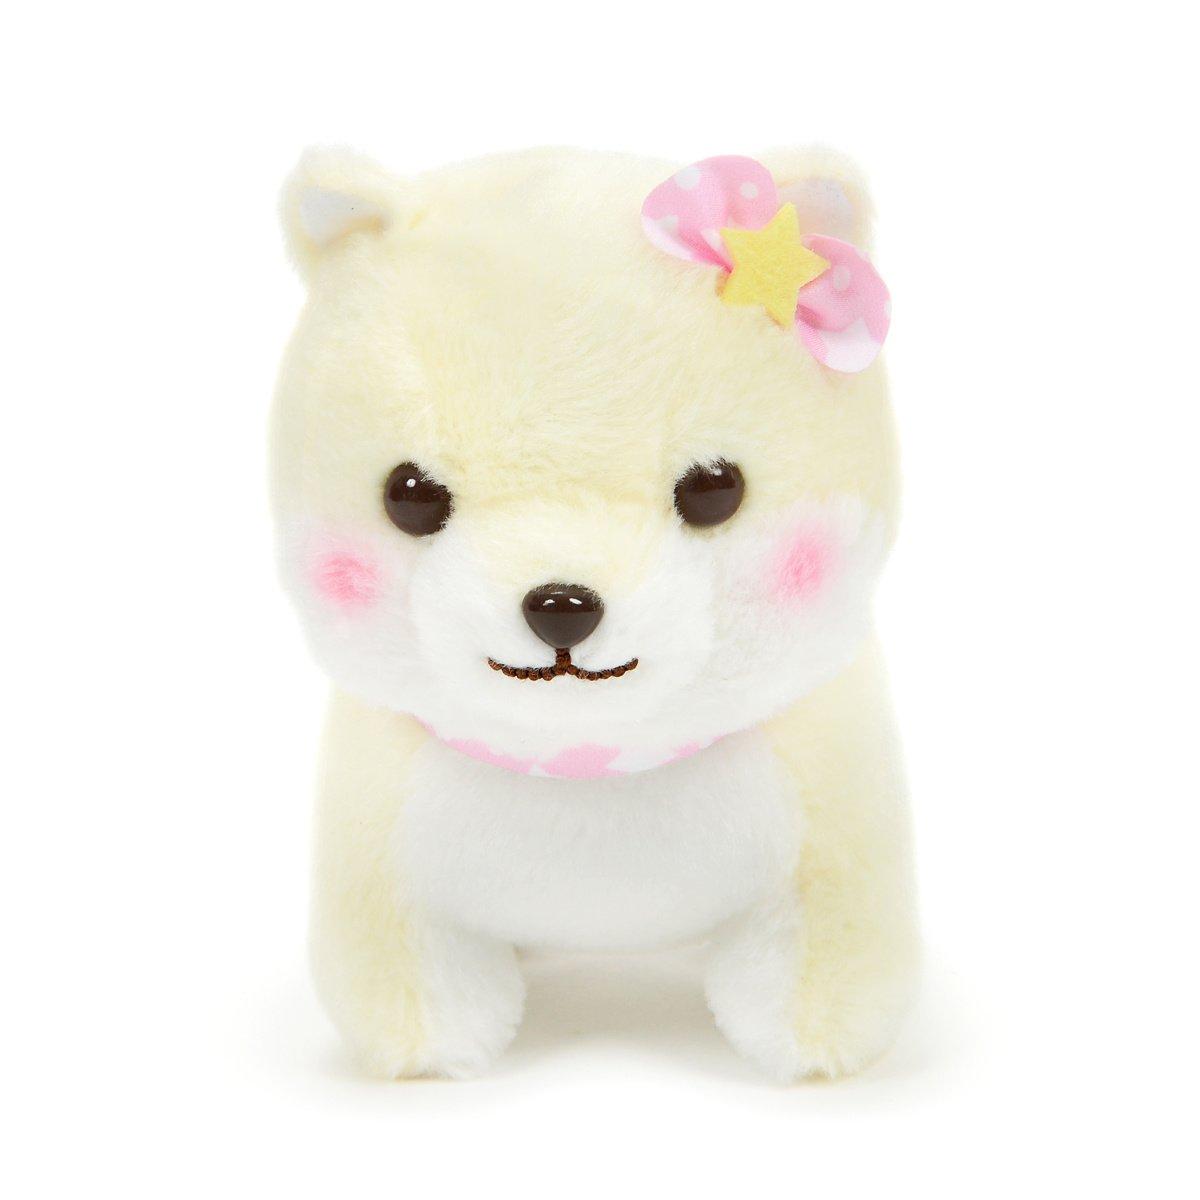 Amuse Dog Plushie, Mameshiba San Kyodai Funwari Yume no Kuni Sakura Pastel Yellow 5 Inches Standard Size